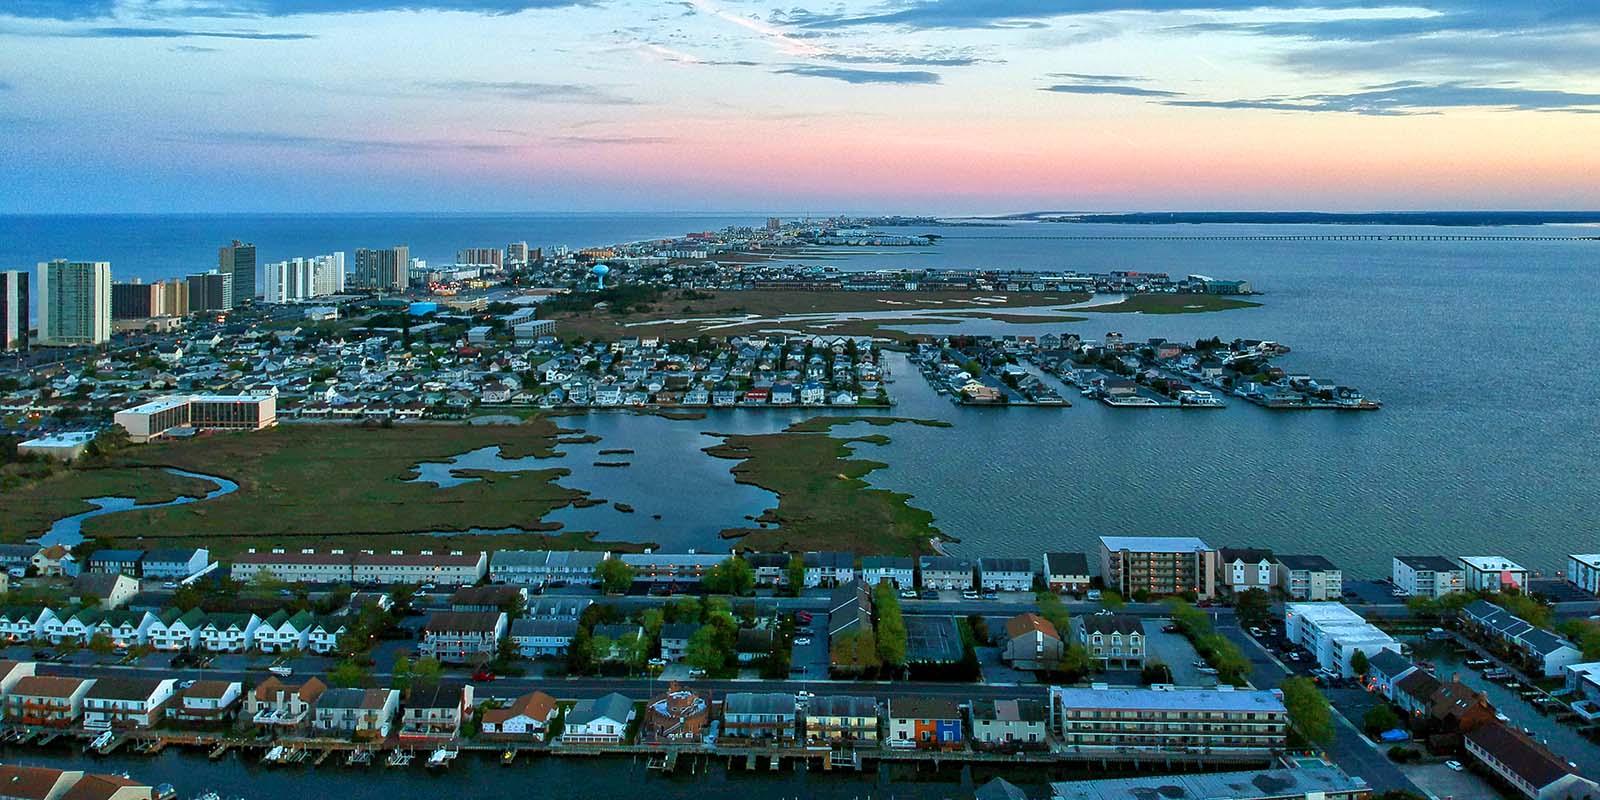 Ocean City, Maryland, USA